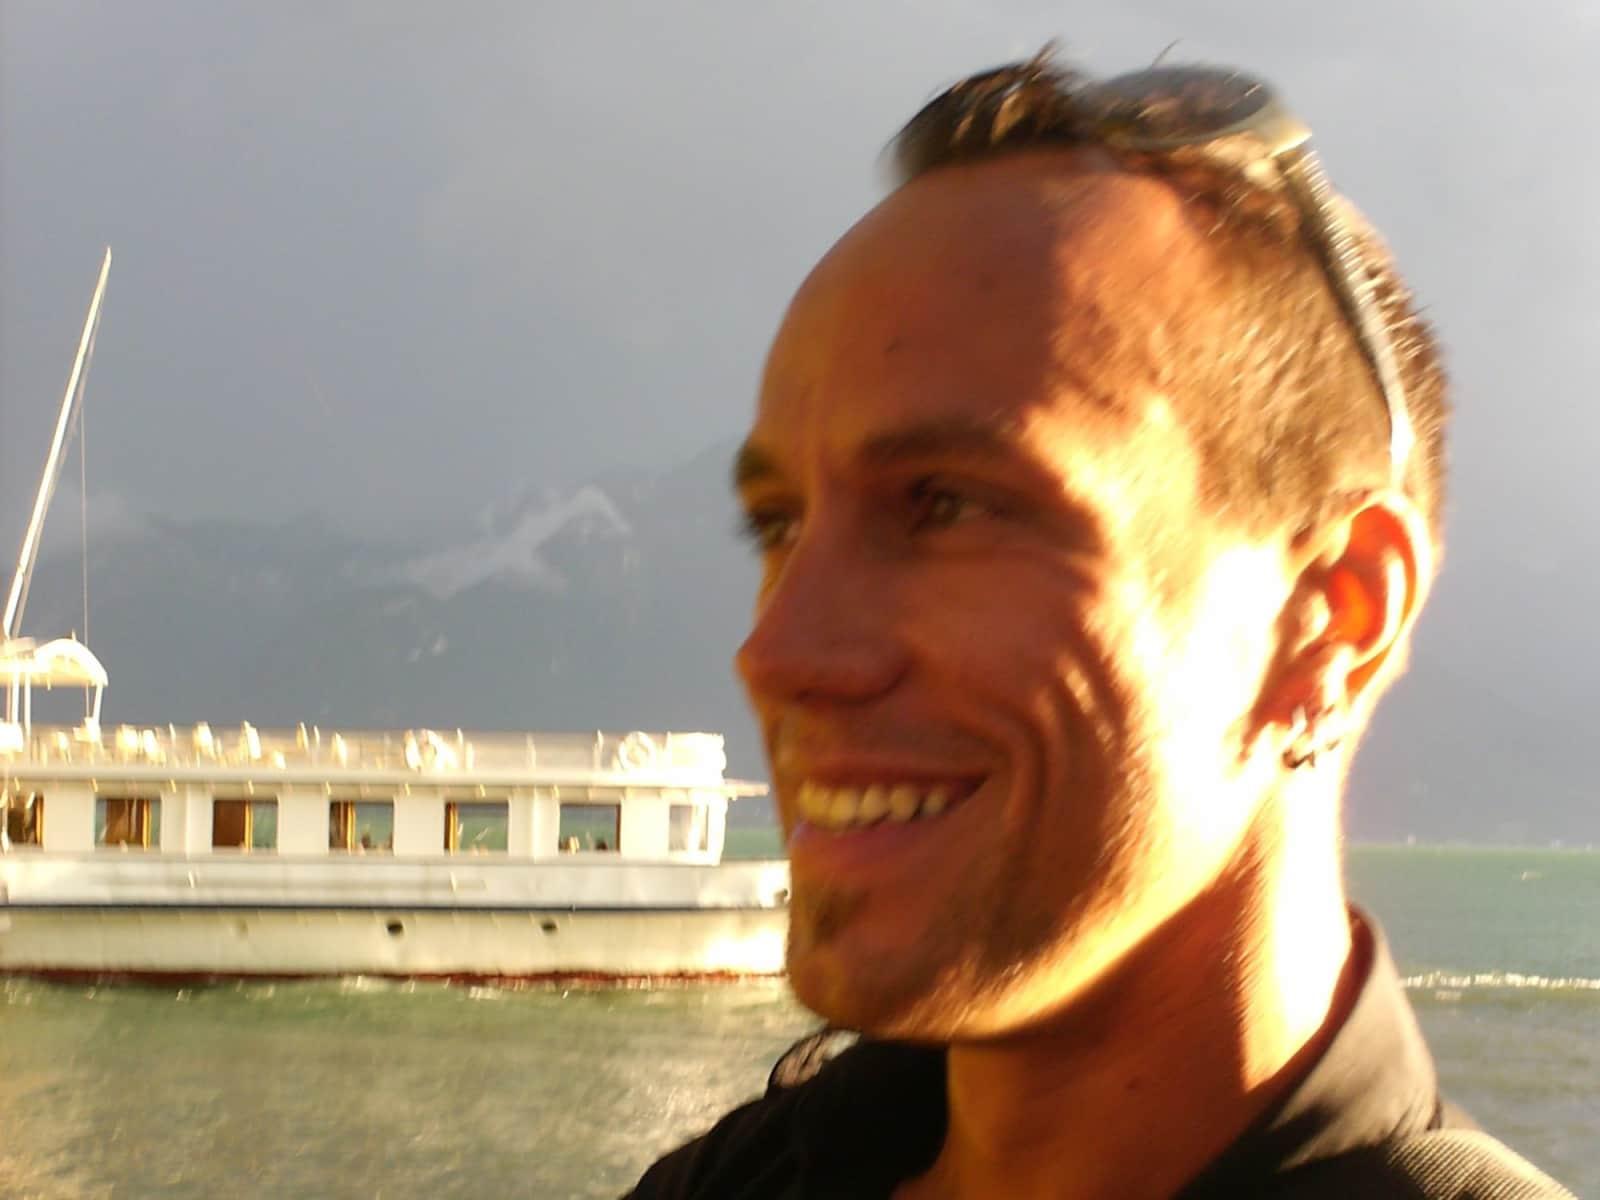 Lars from Lausanne, Switzerland